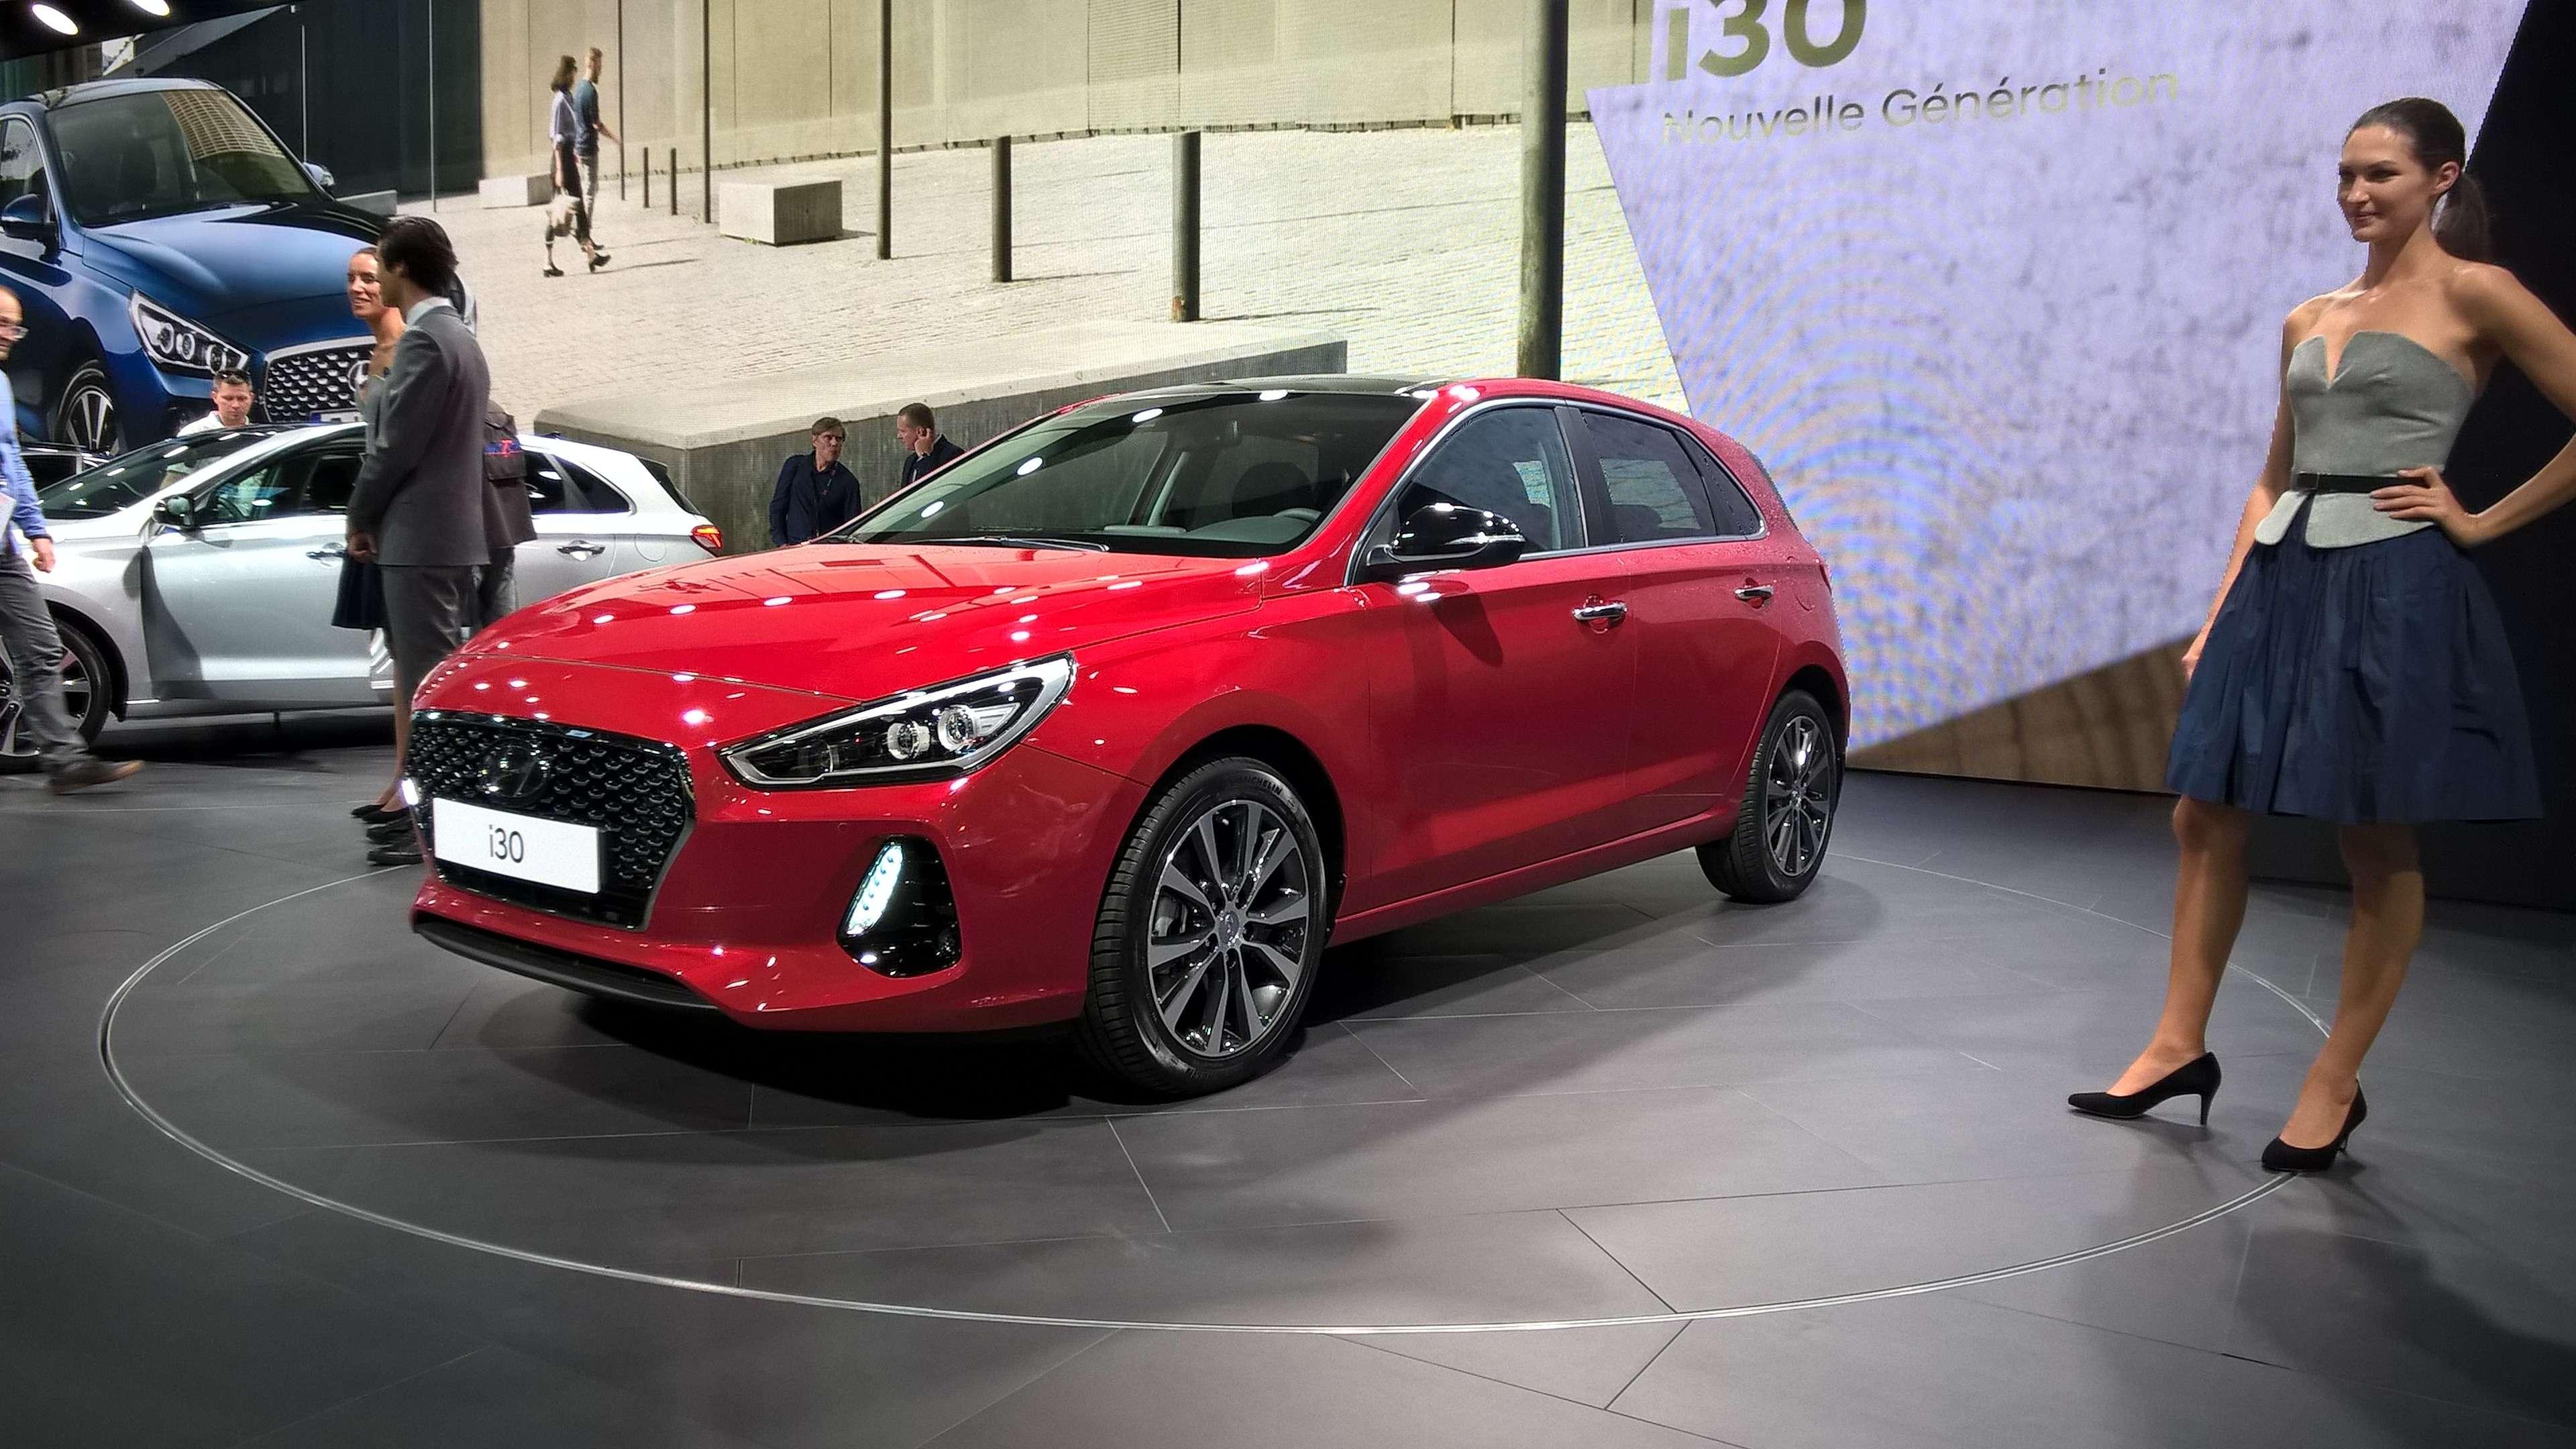 В тени концепта: вПариже дебютировал новый Hyundai i30— фото 642322